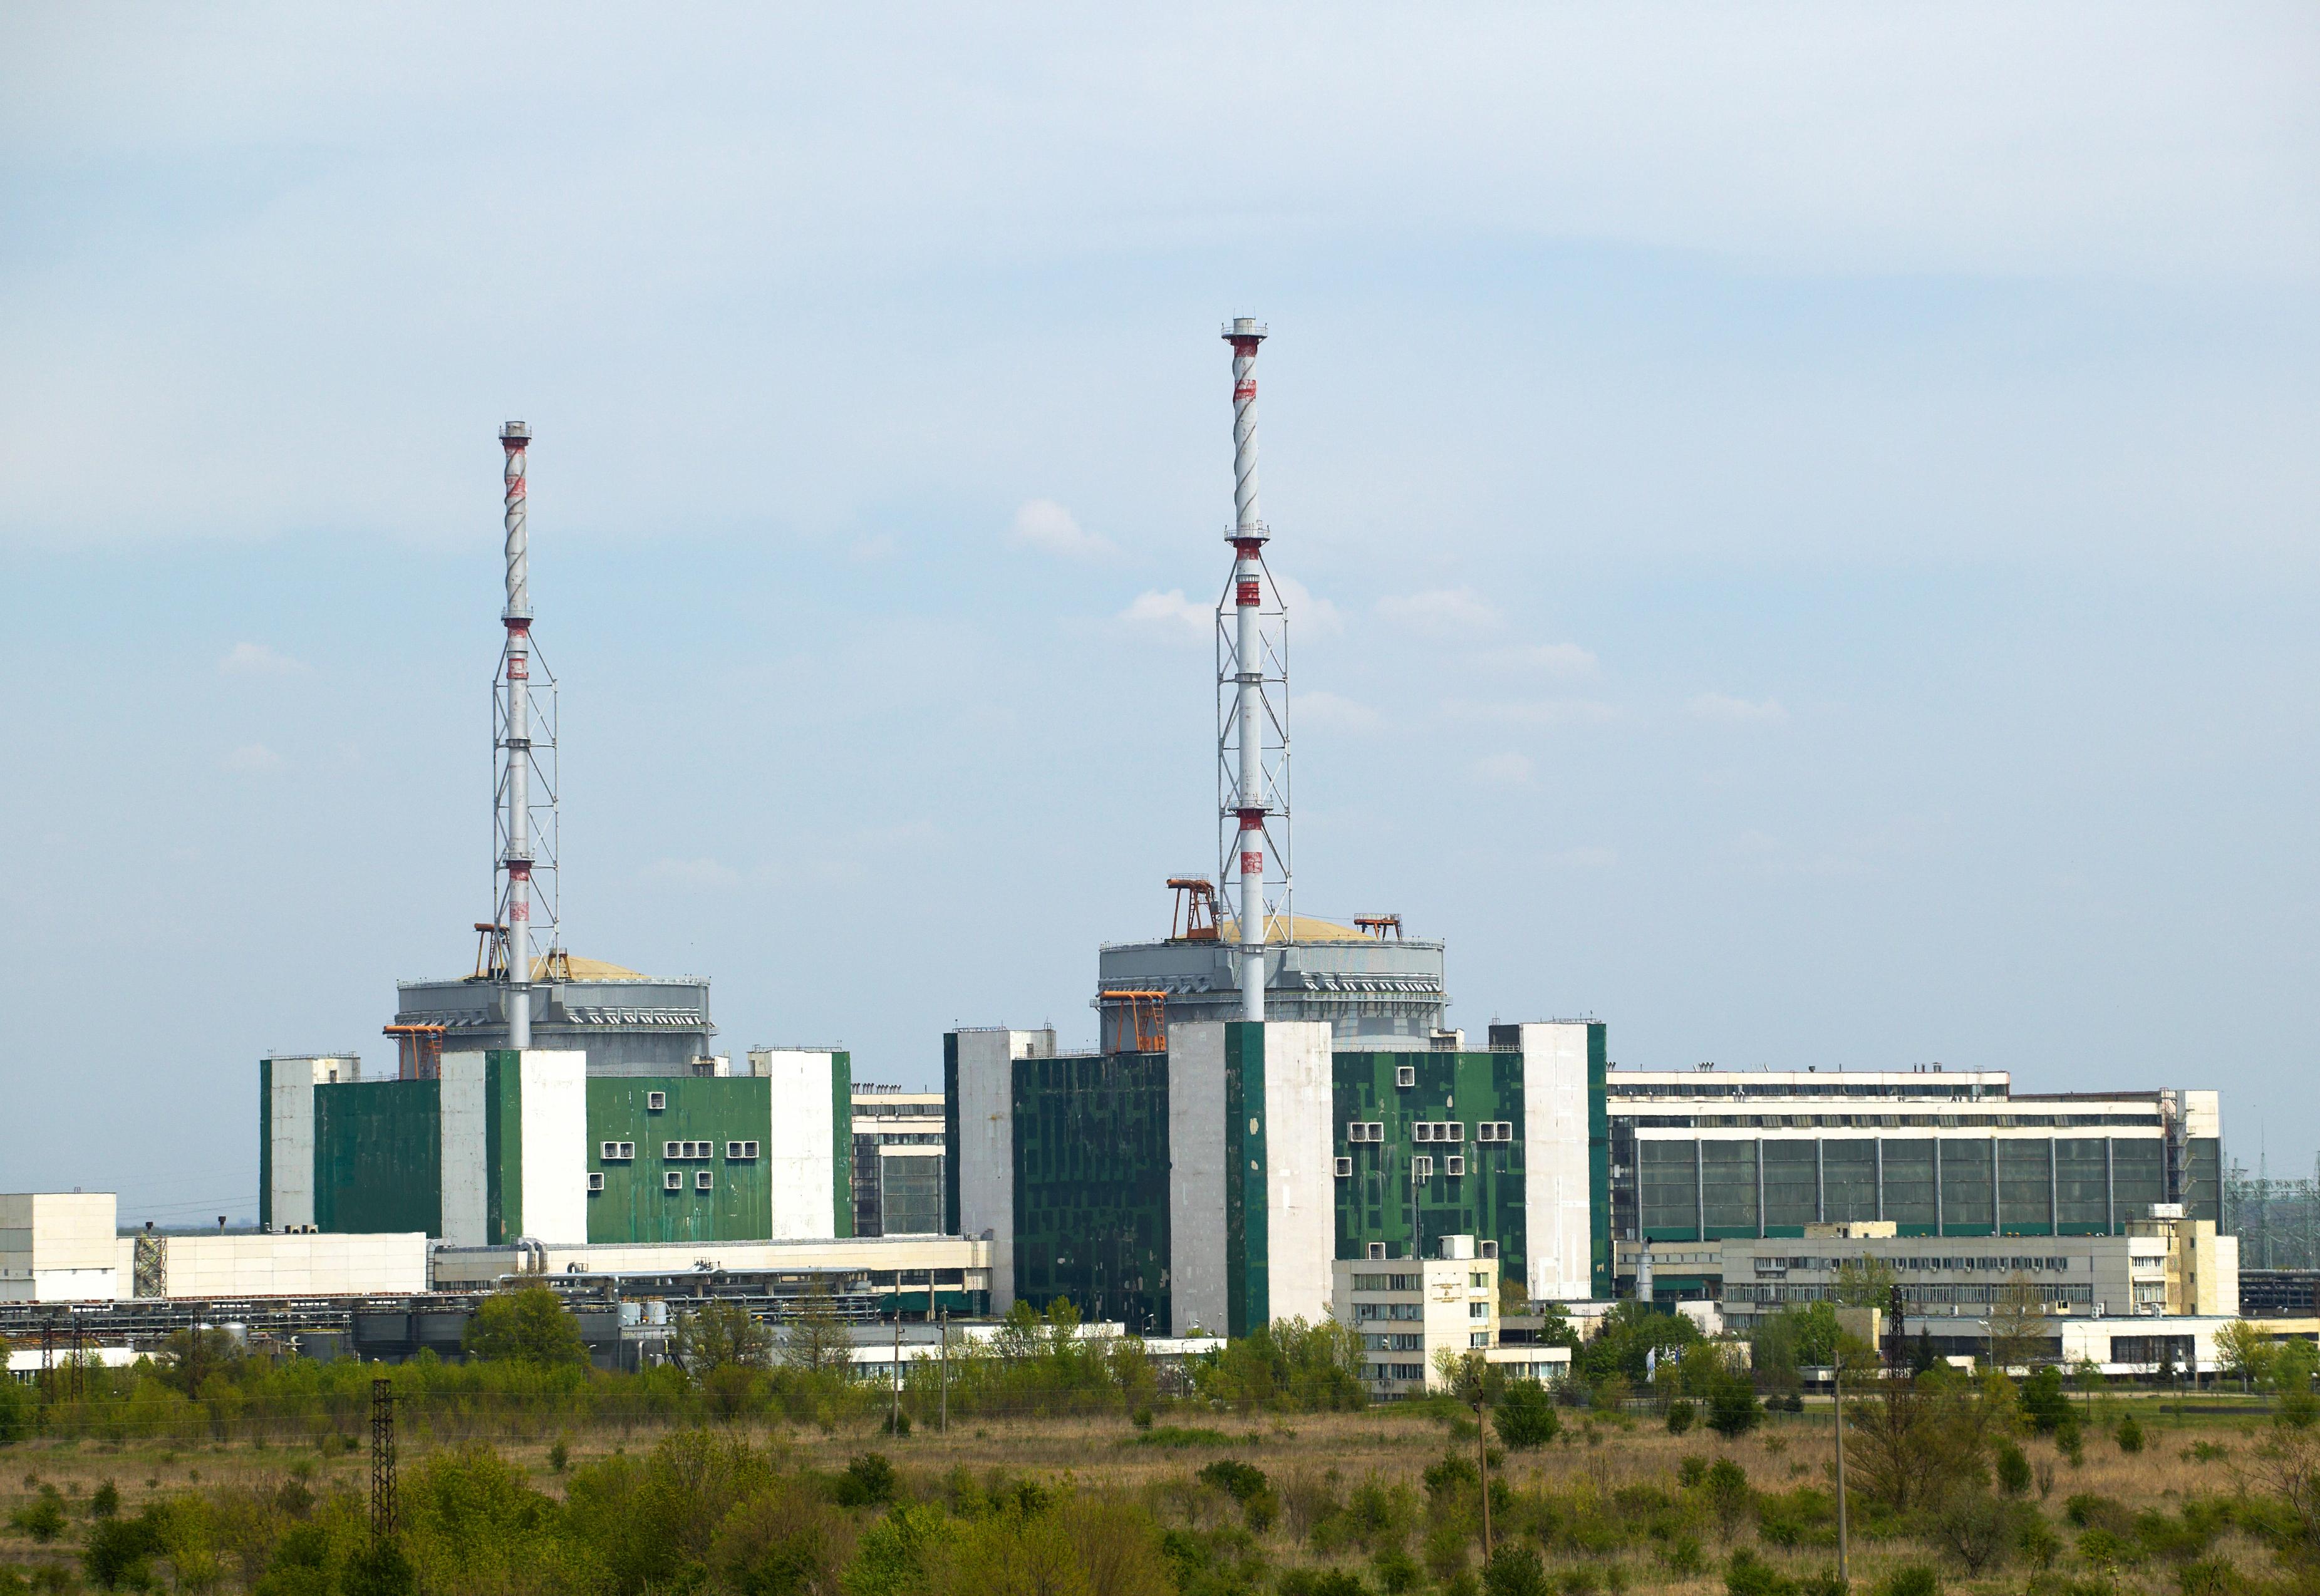 Bulgaria's NPP Kozloduy shuts down Unit 5 for planned maintenance